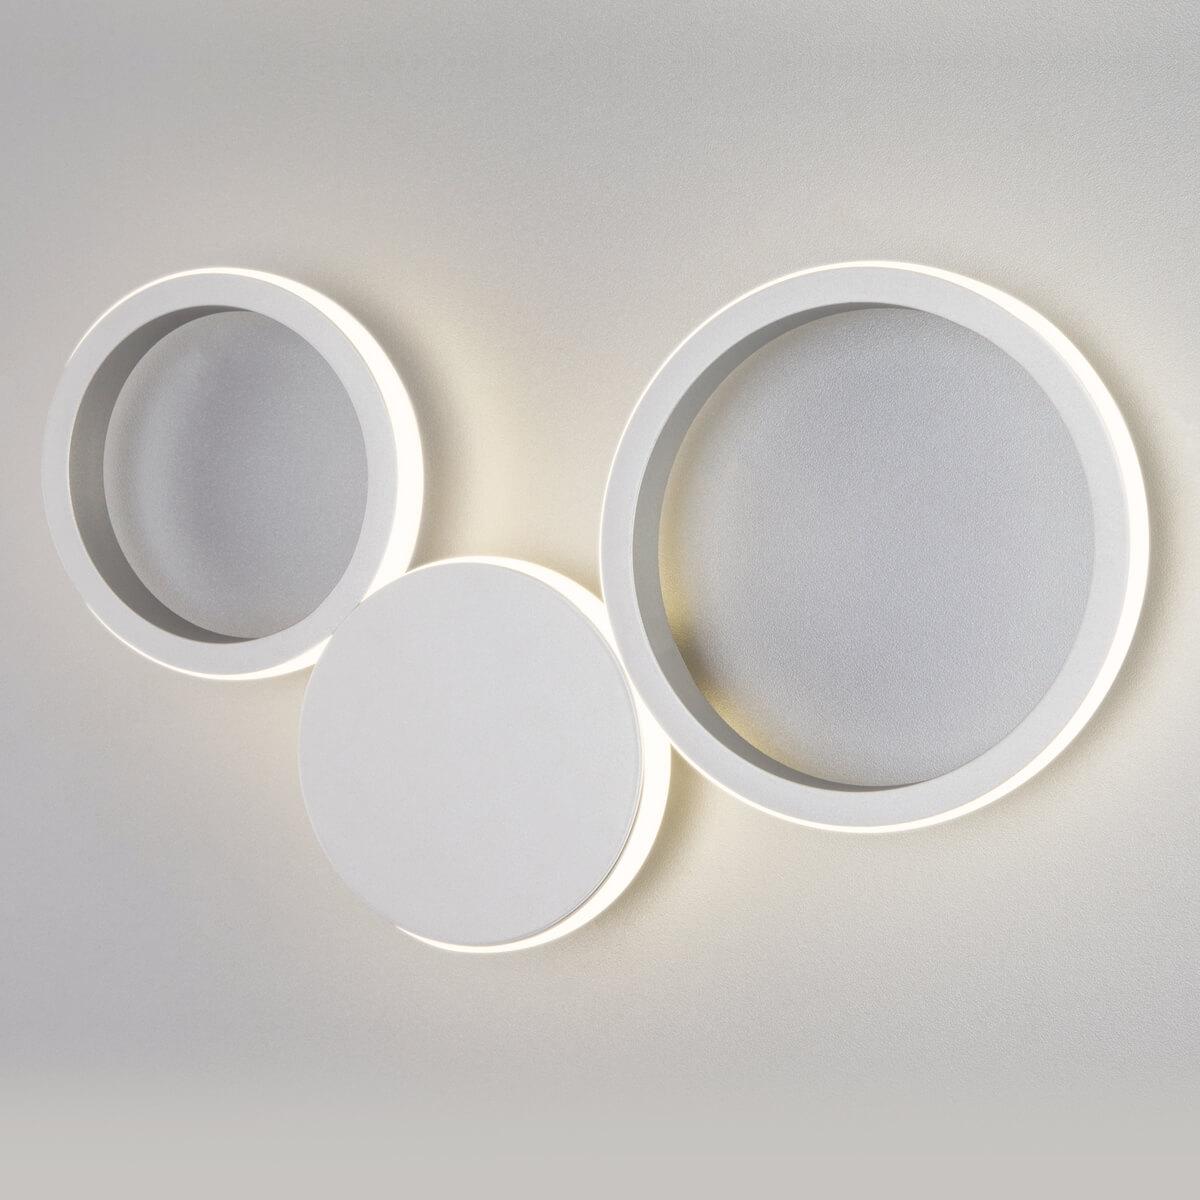 Светильник Eurosvet 40141/1 LED серебро Rings